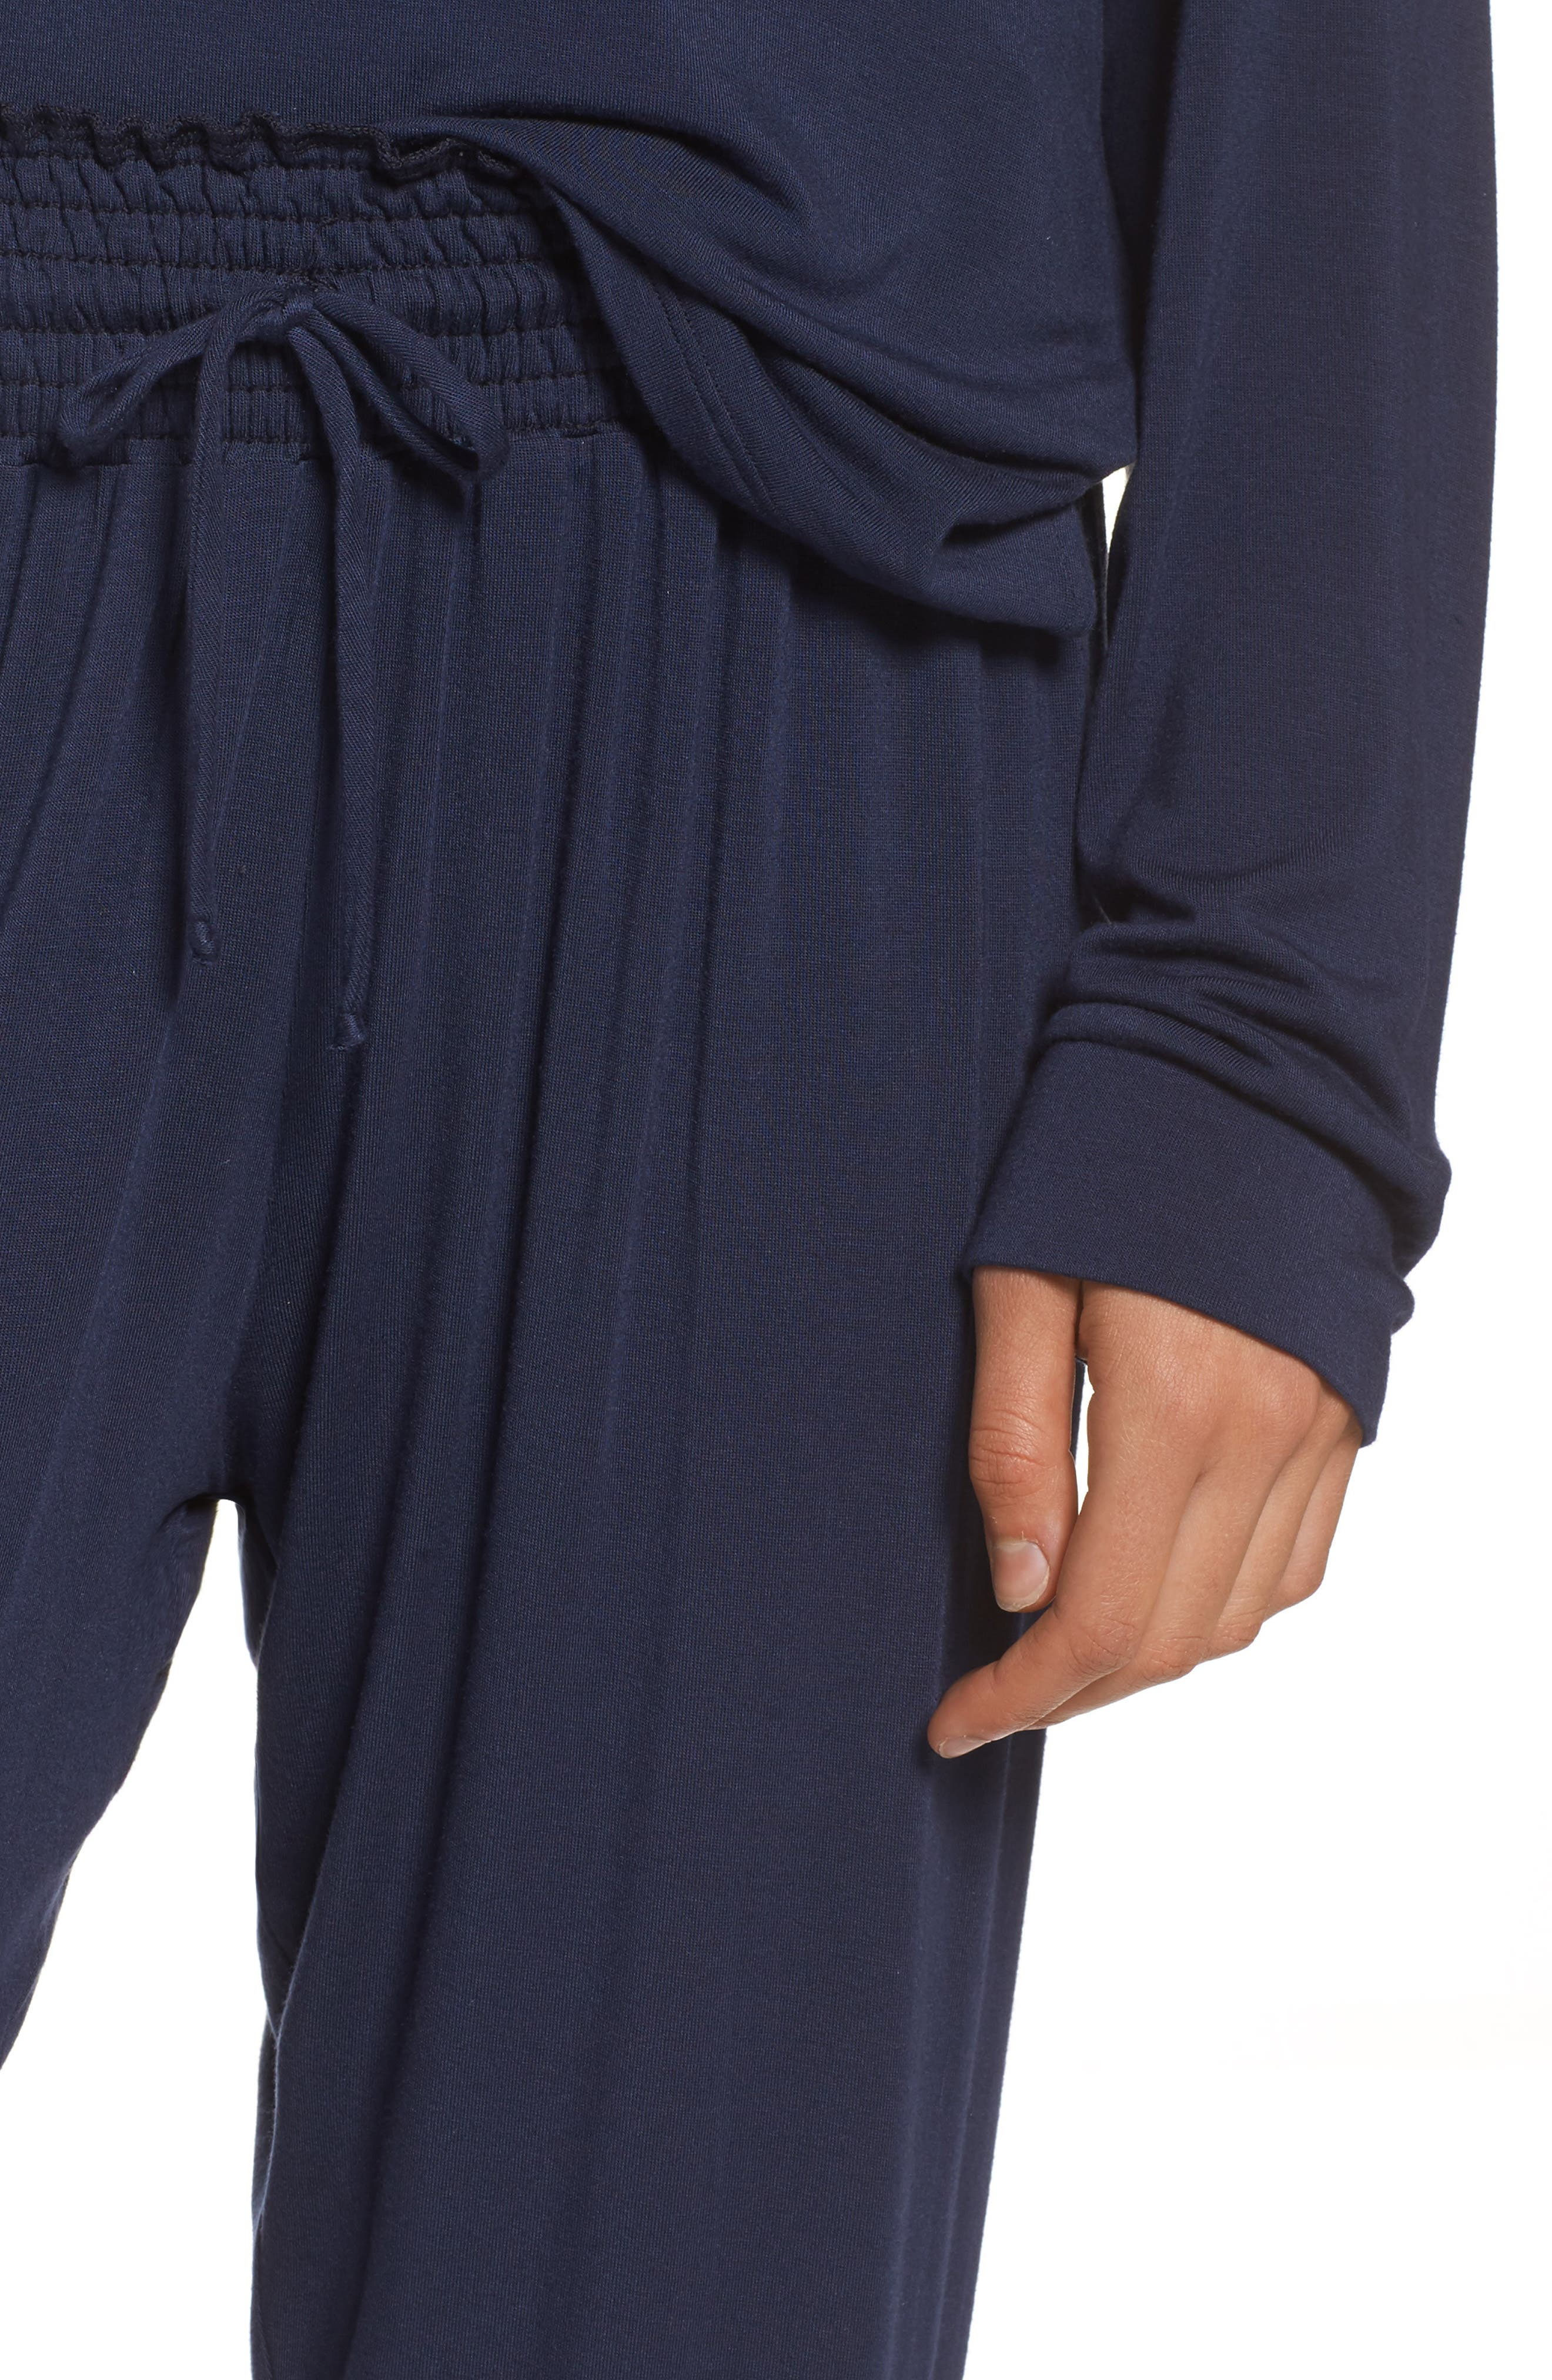 Amber Long Sleeve Top,                             Alternate thumbnail 4, color,